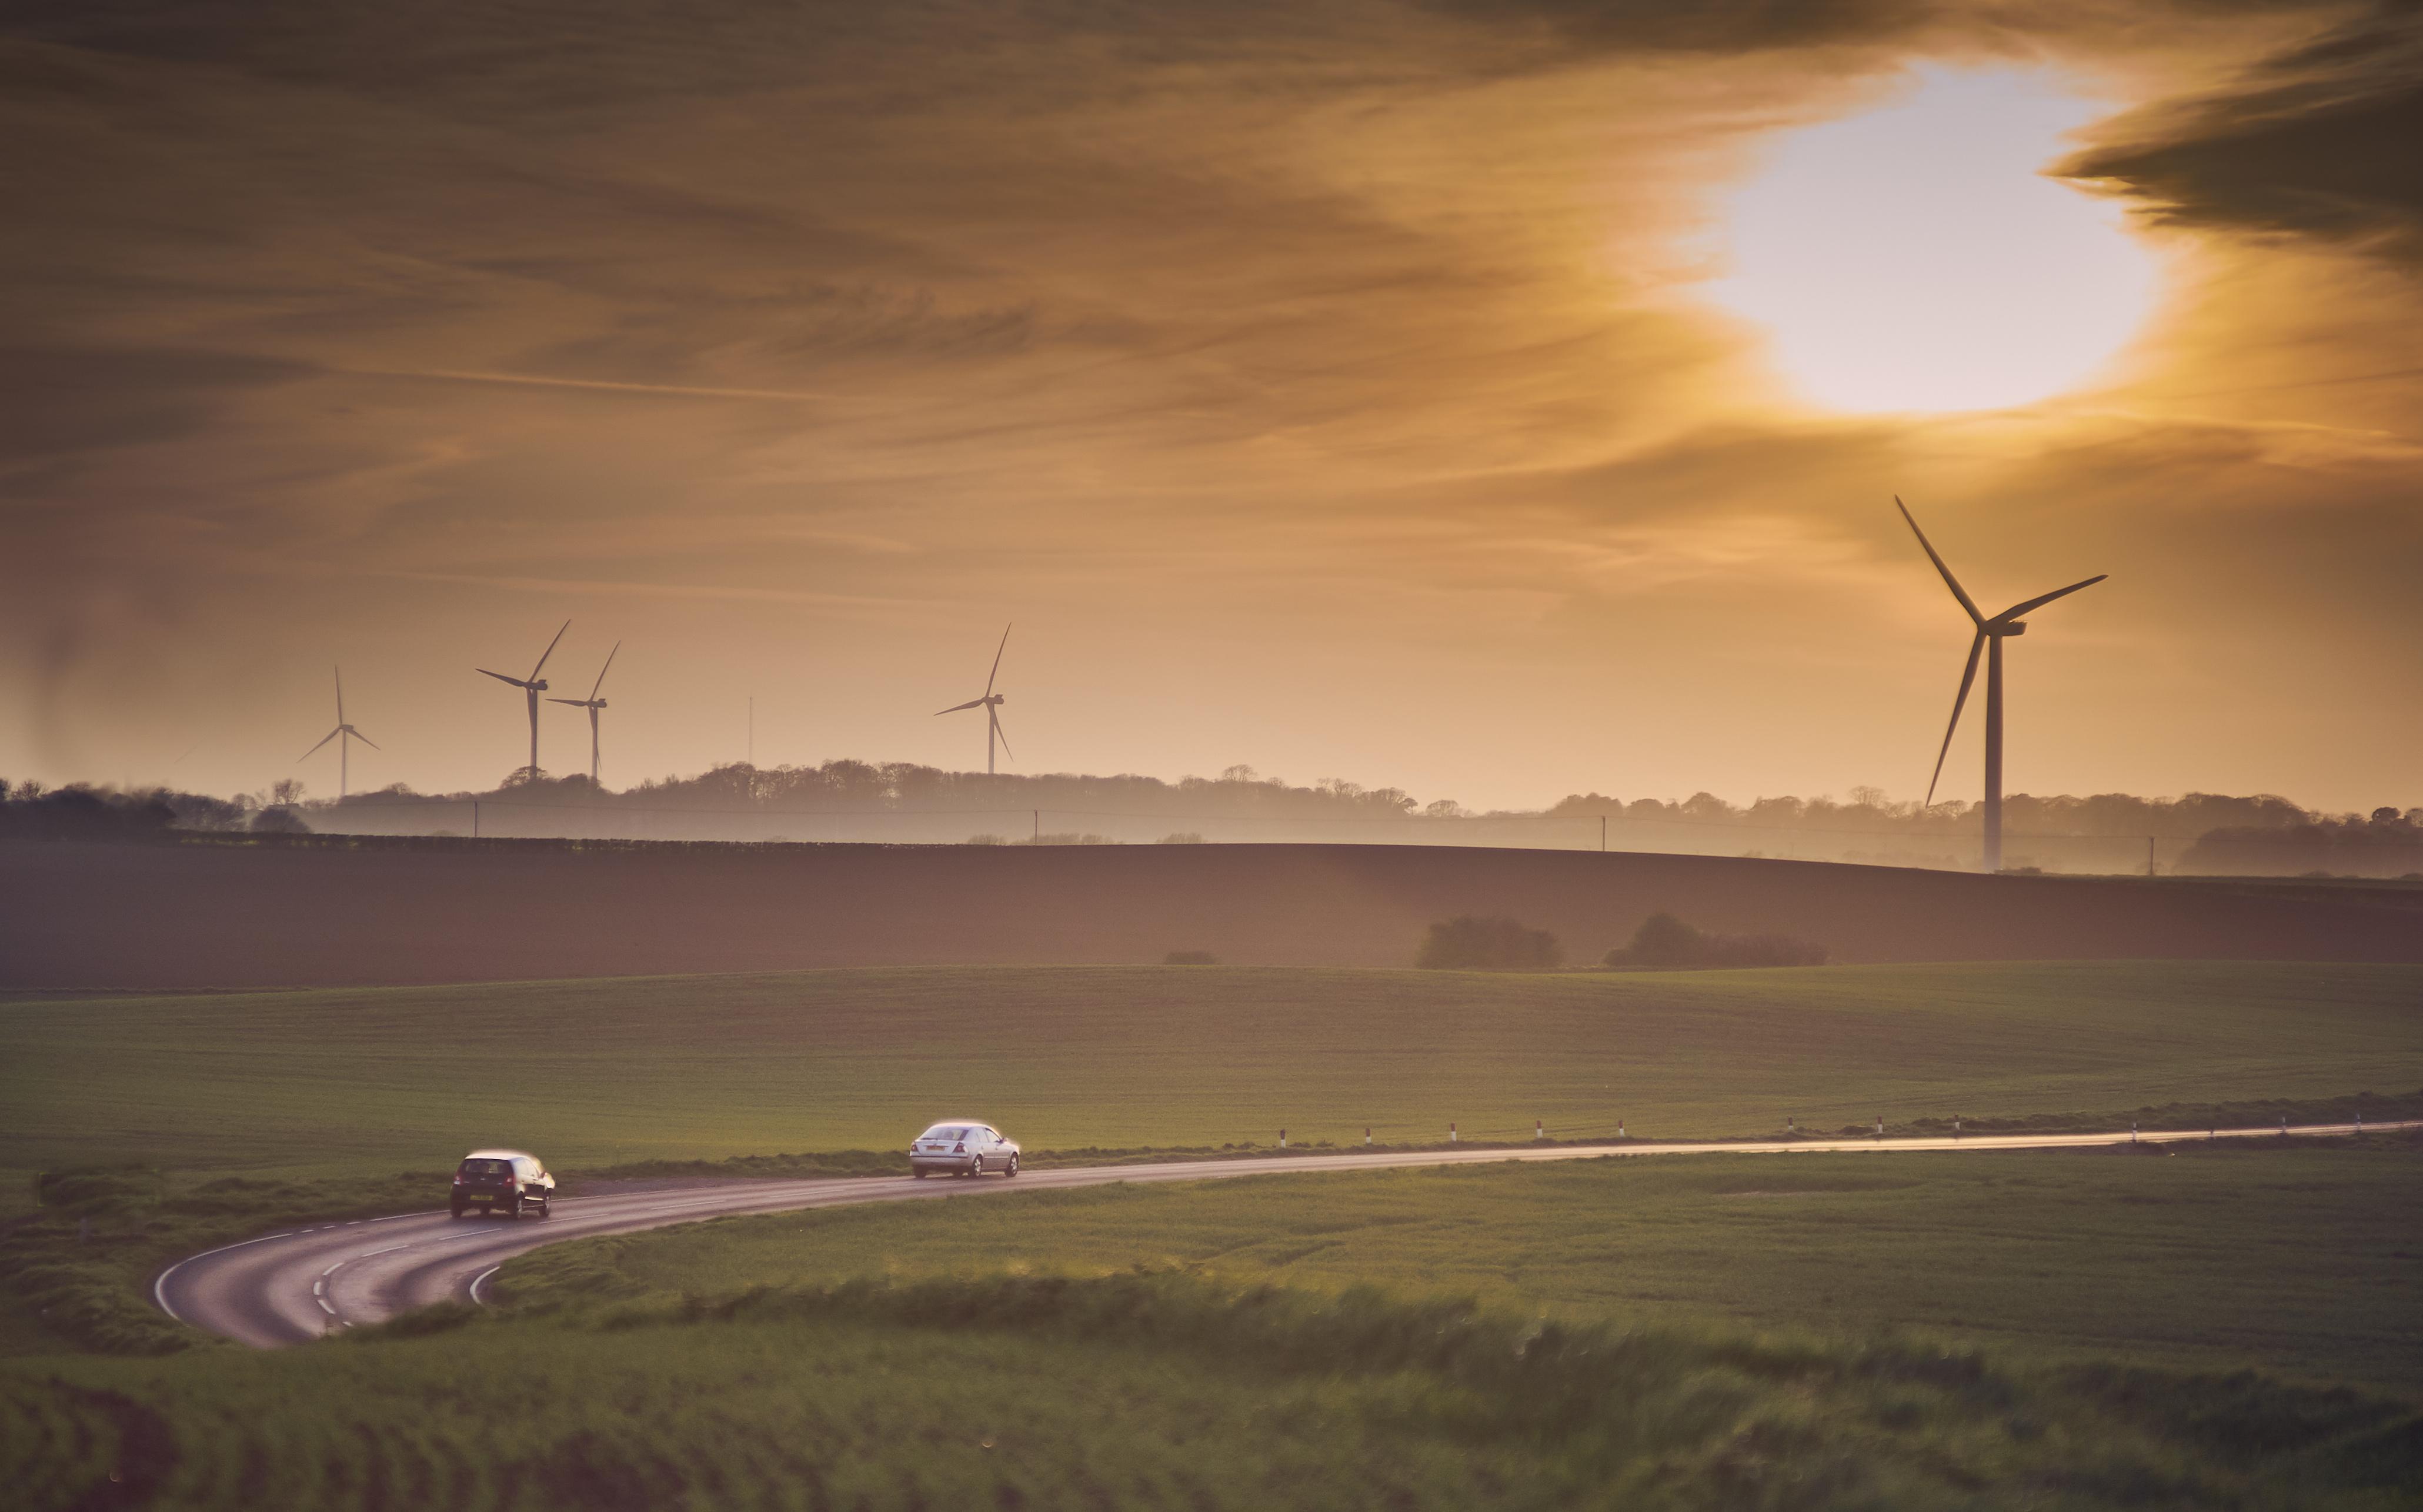 Rural uk wind farm